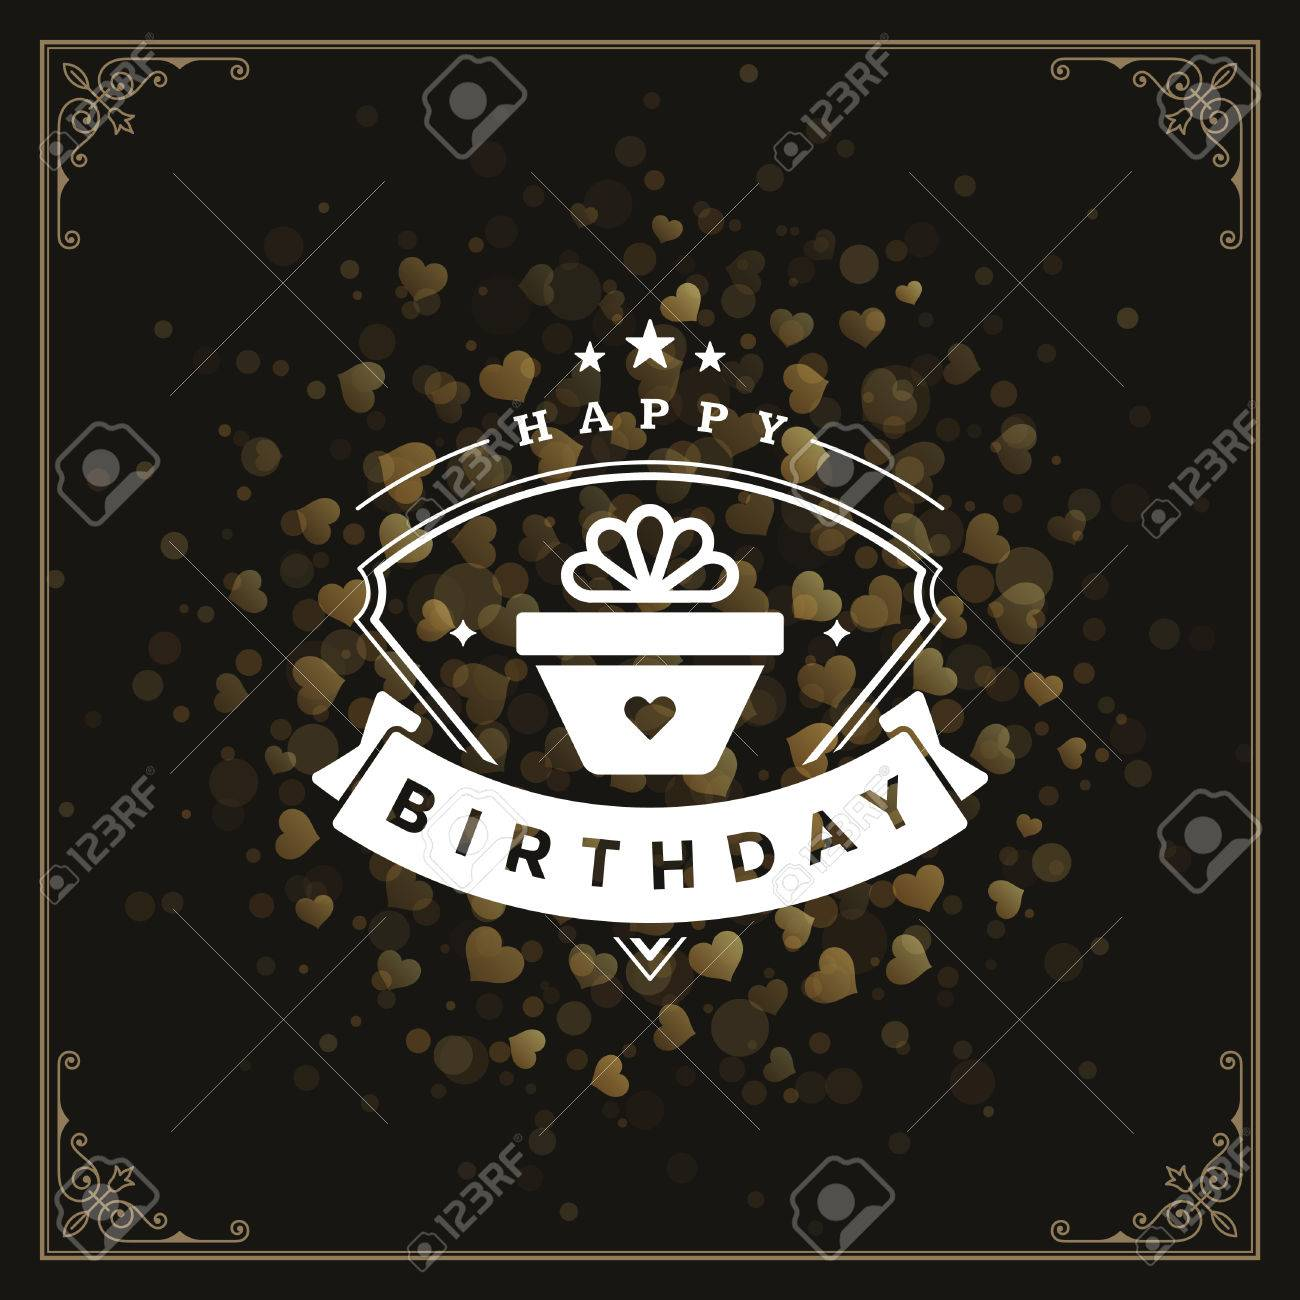 Happy birthday greeting card design vector illustration